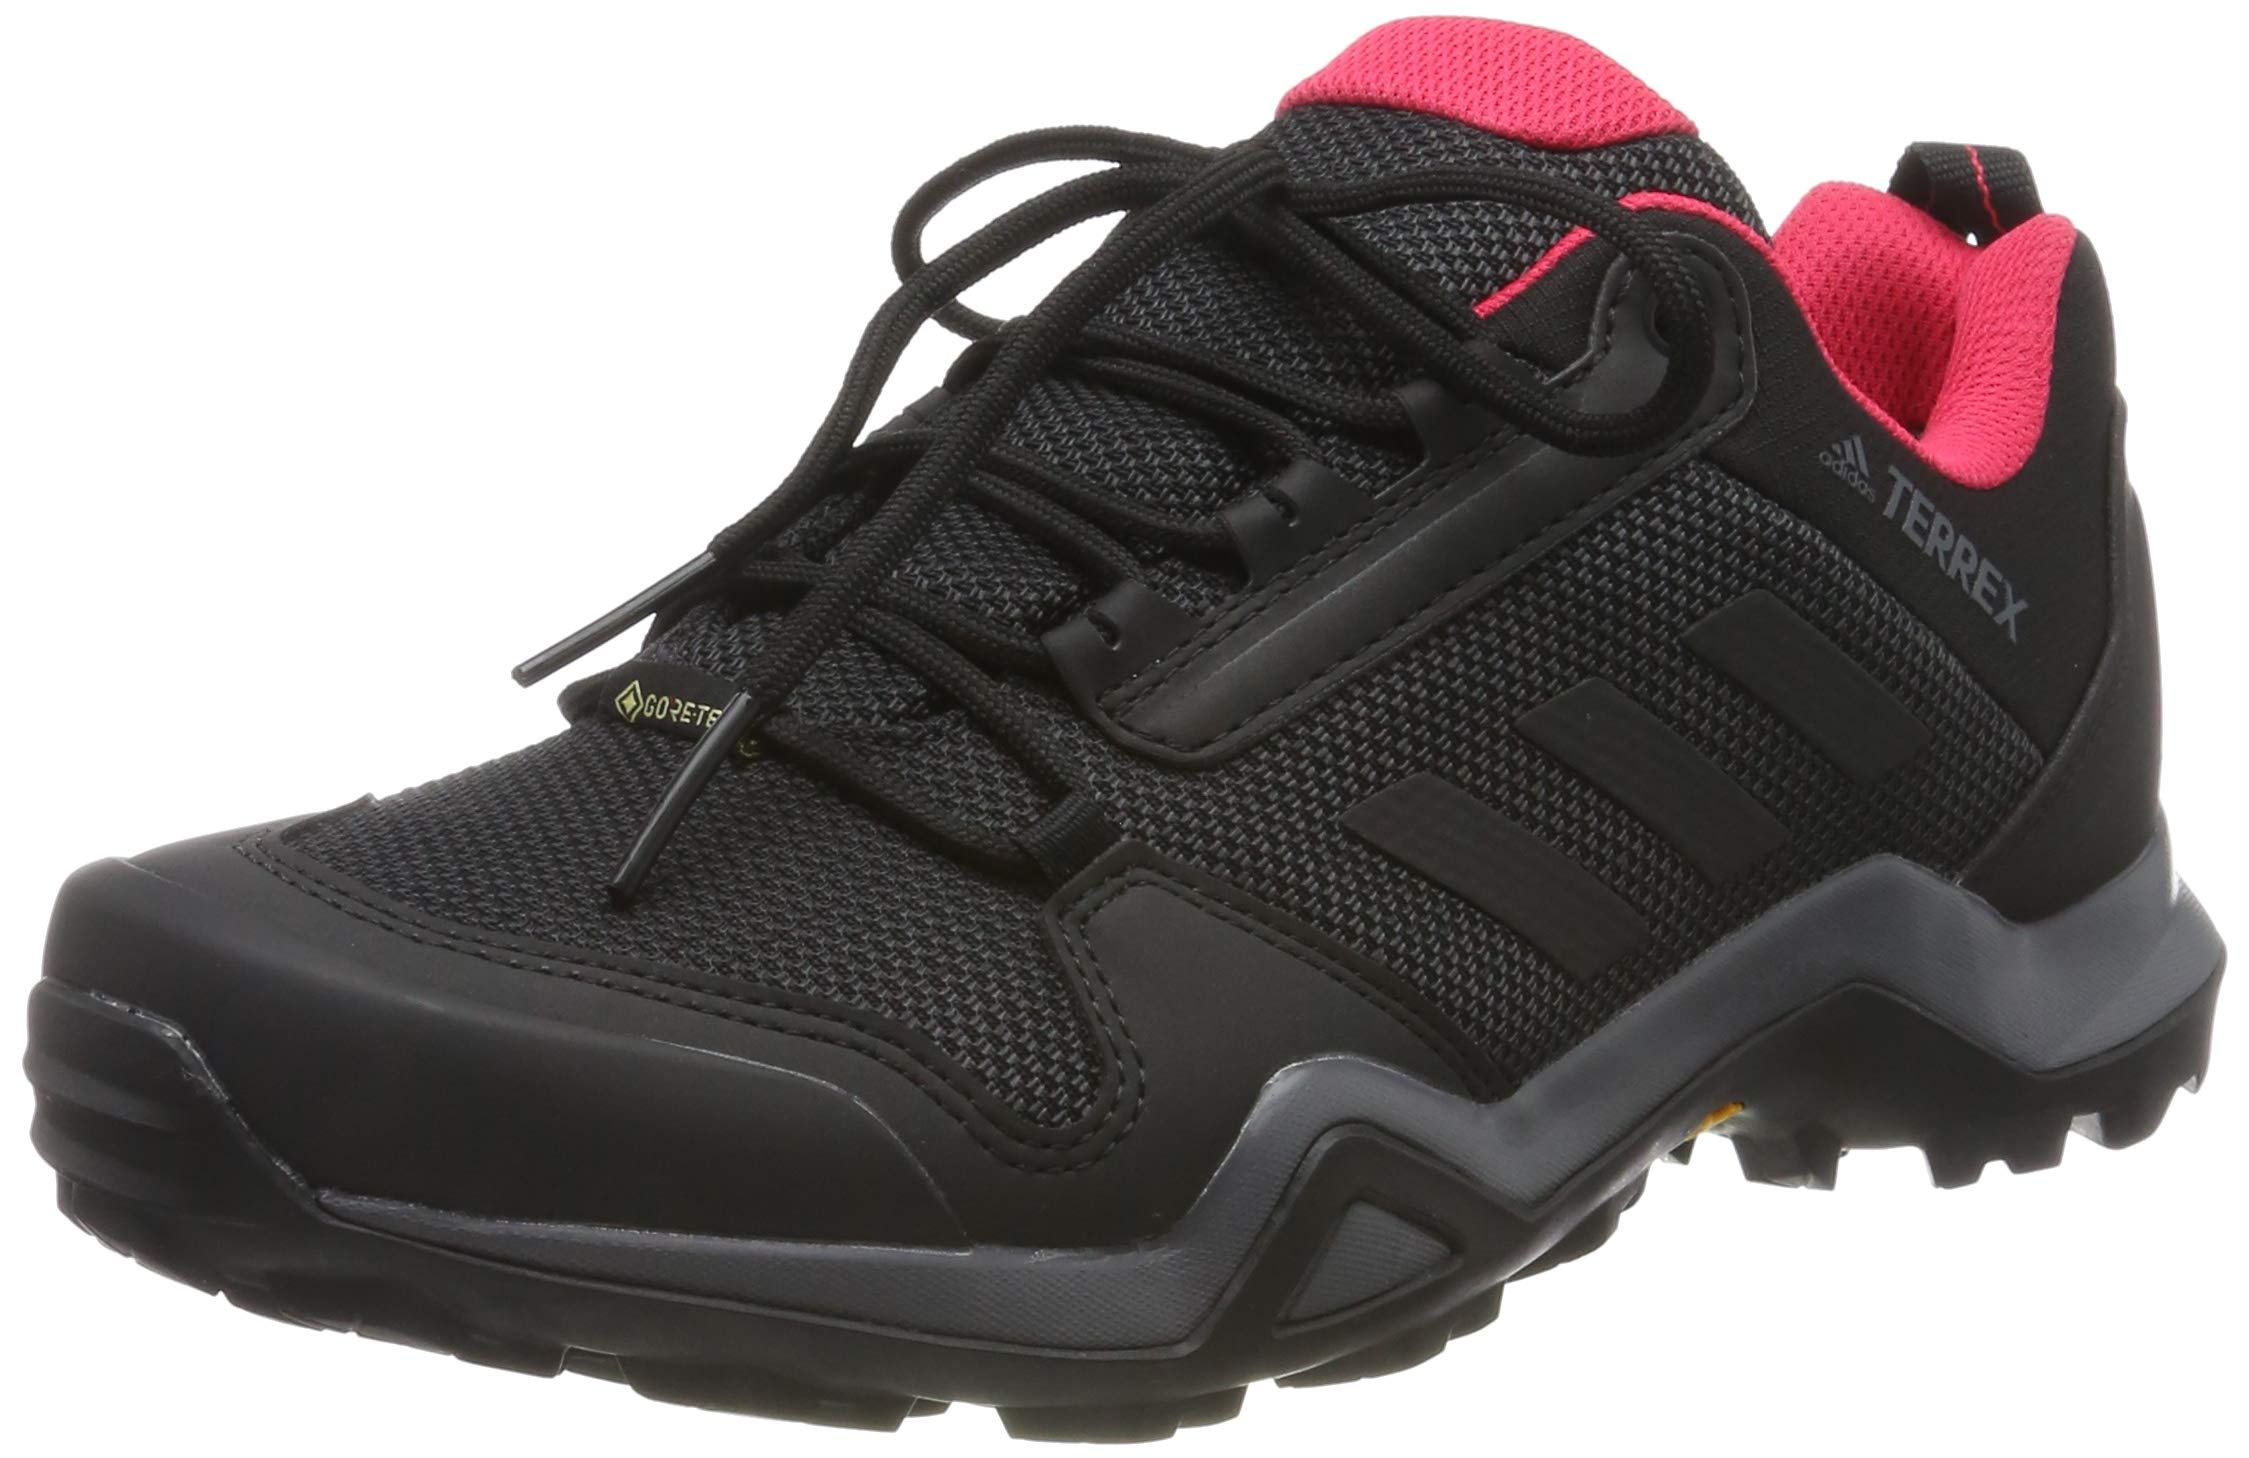 adidas Women's Terrex Ax3 GTX W Trail Running Shoe - Buy ...